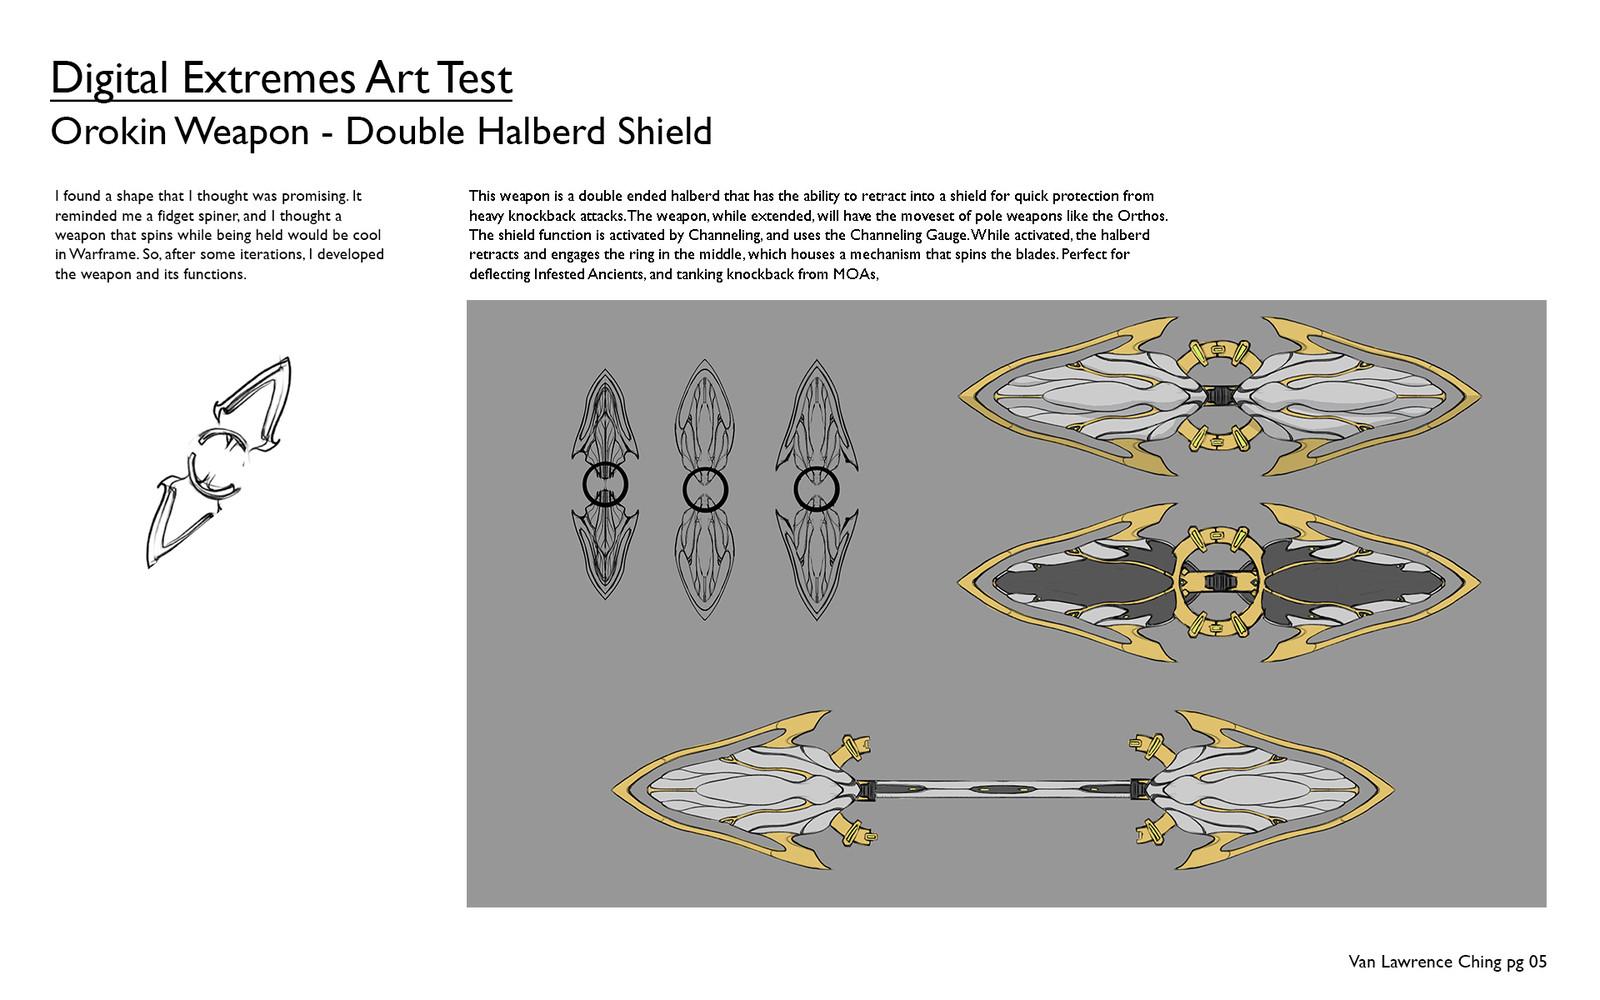 Digital Extremes Art Test: Orokin Weapon